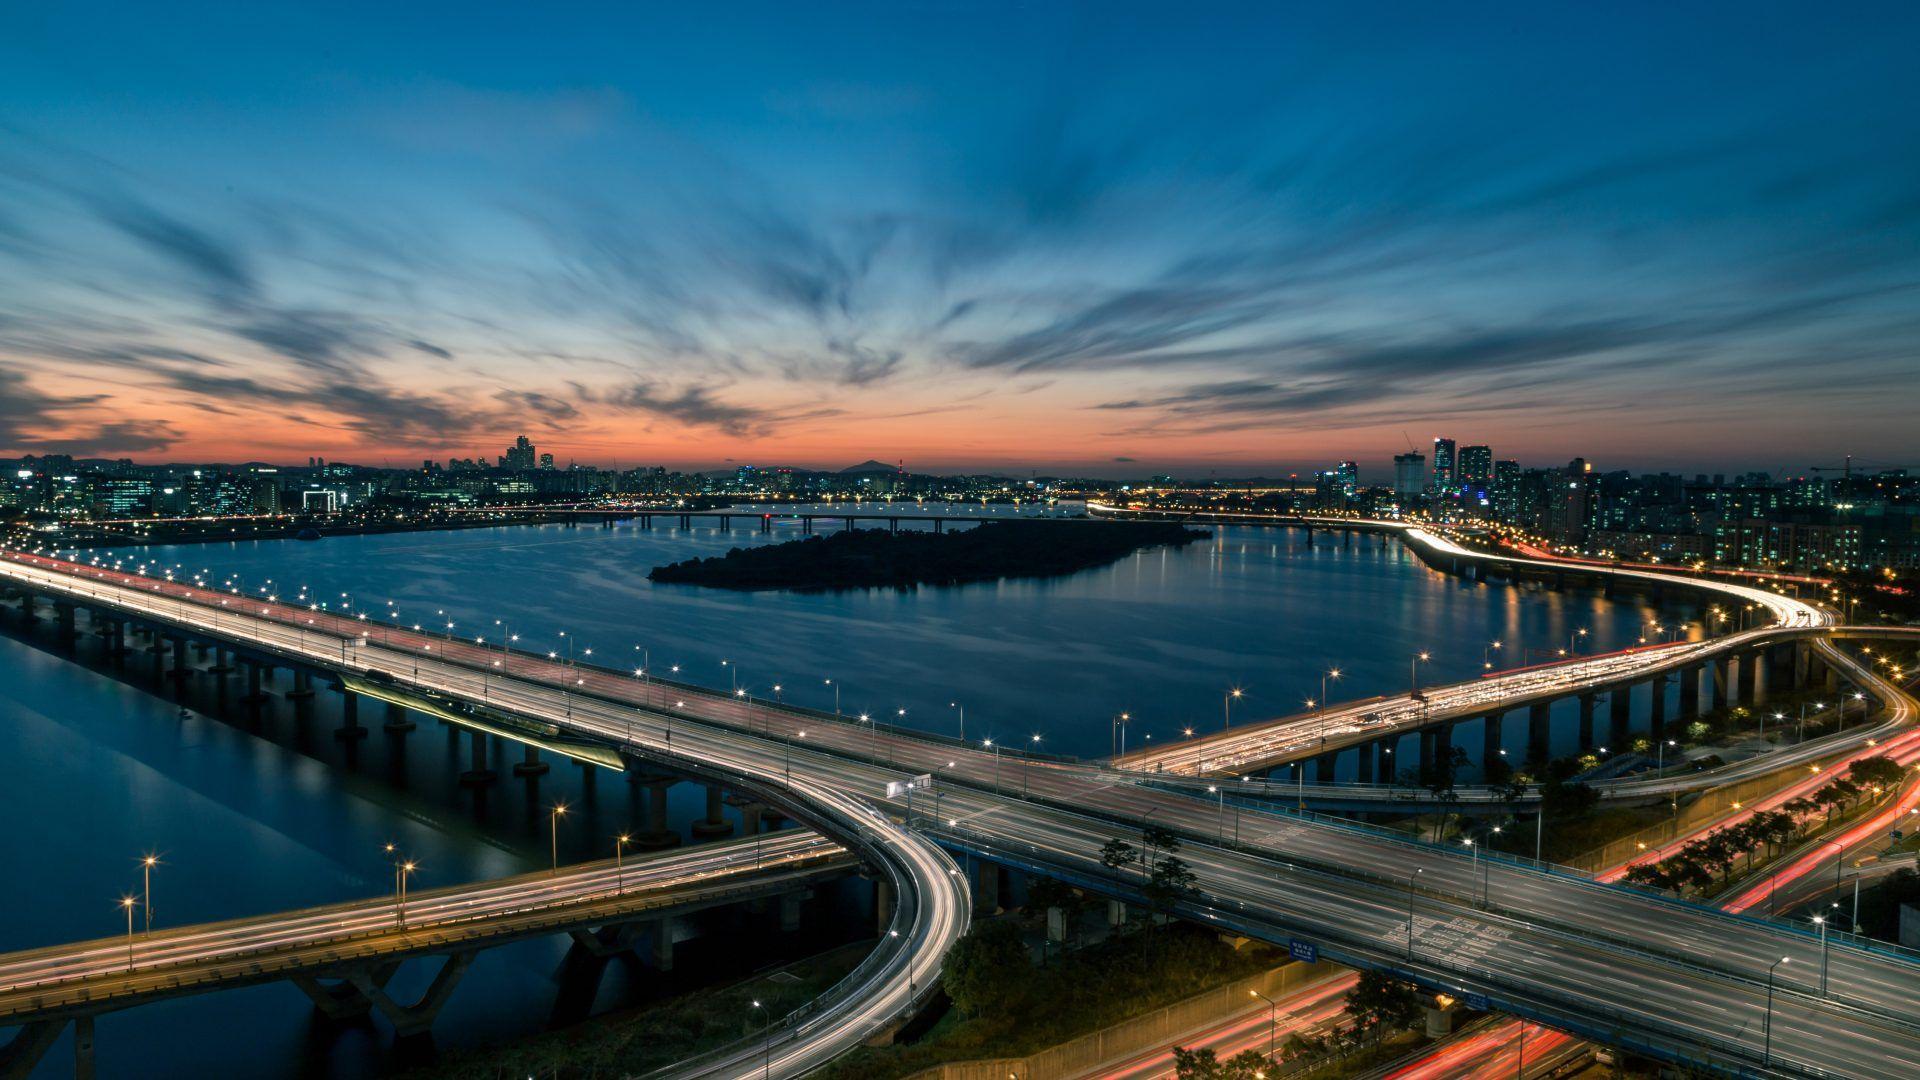 Download Wallpaper 1920x1080 River Sunset Bridge: Top Free Seoul Backgrounds